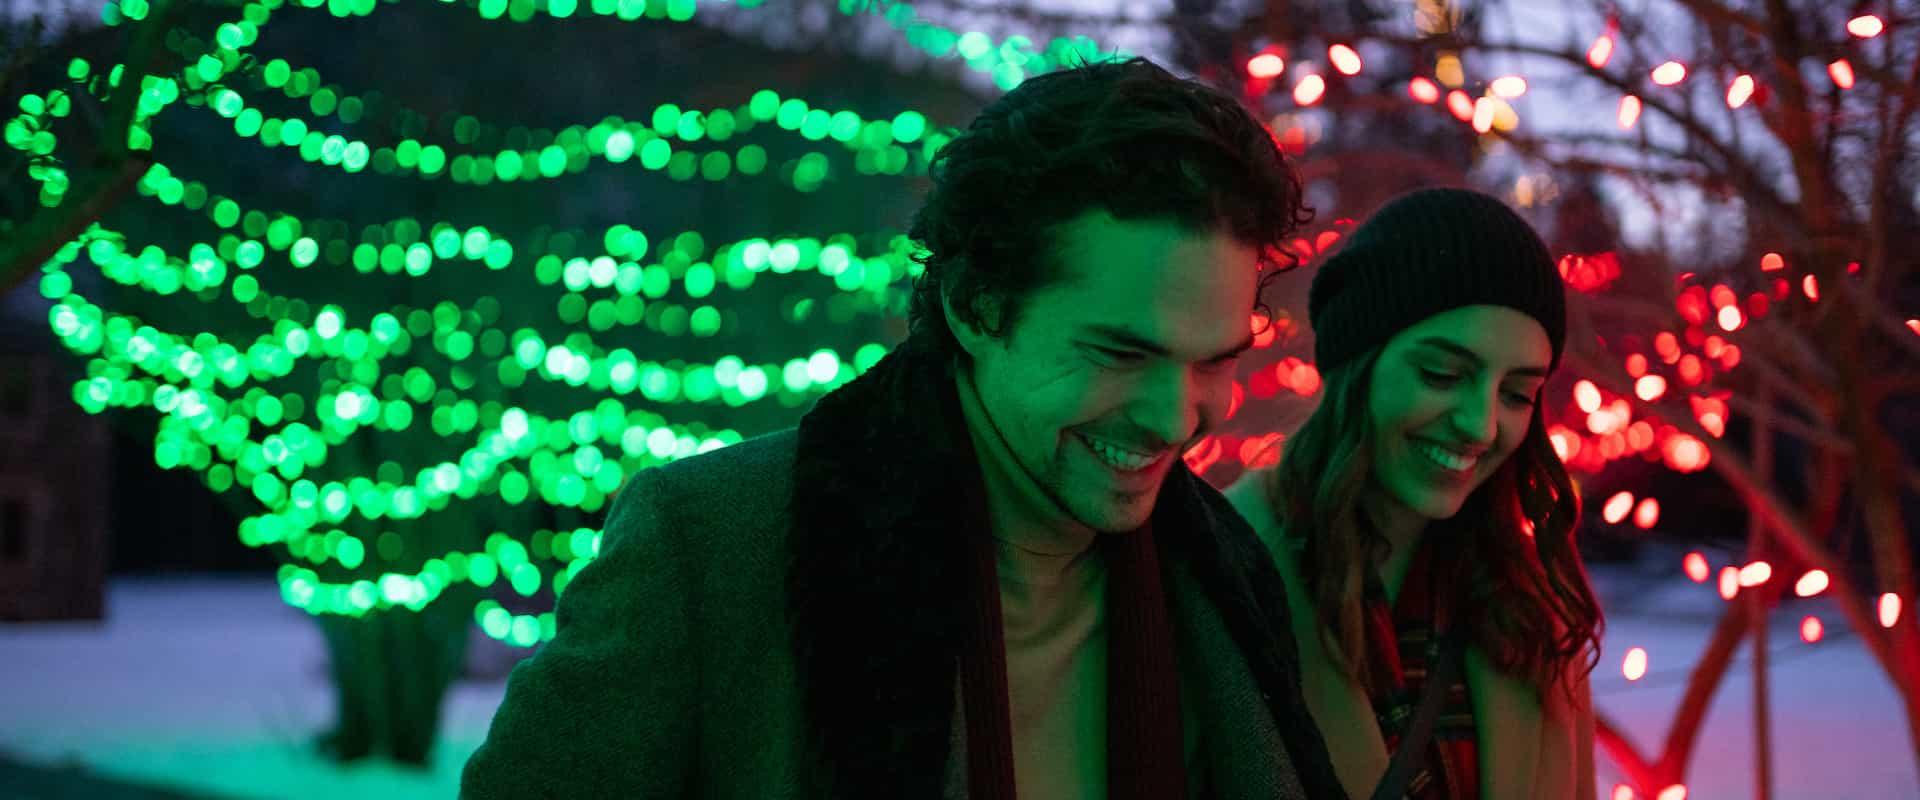 Christmas Lights at Cascade Gardens